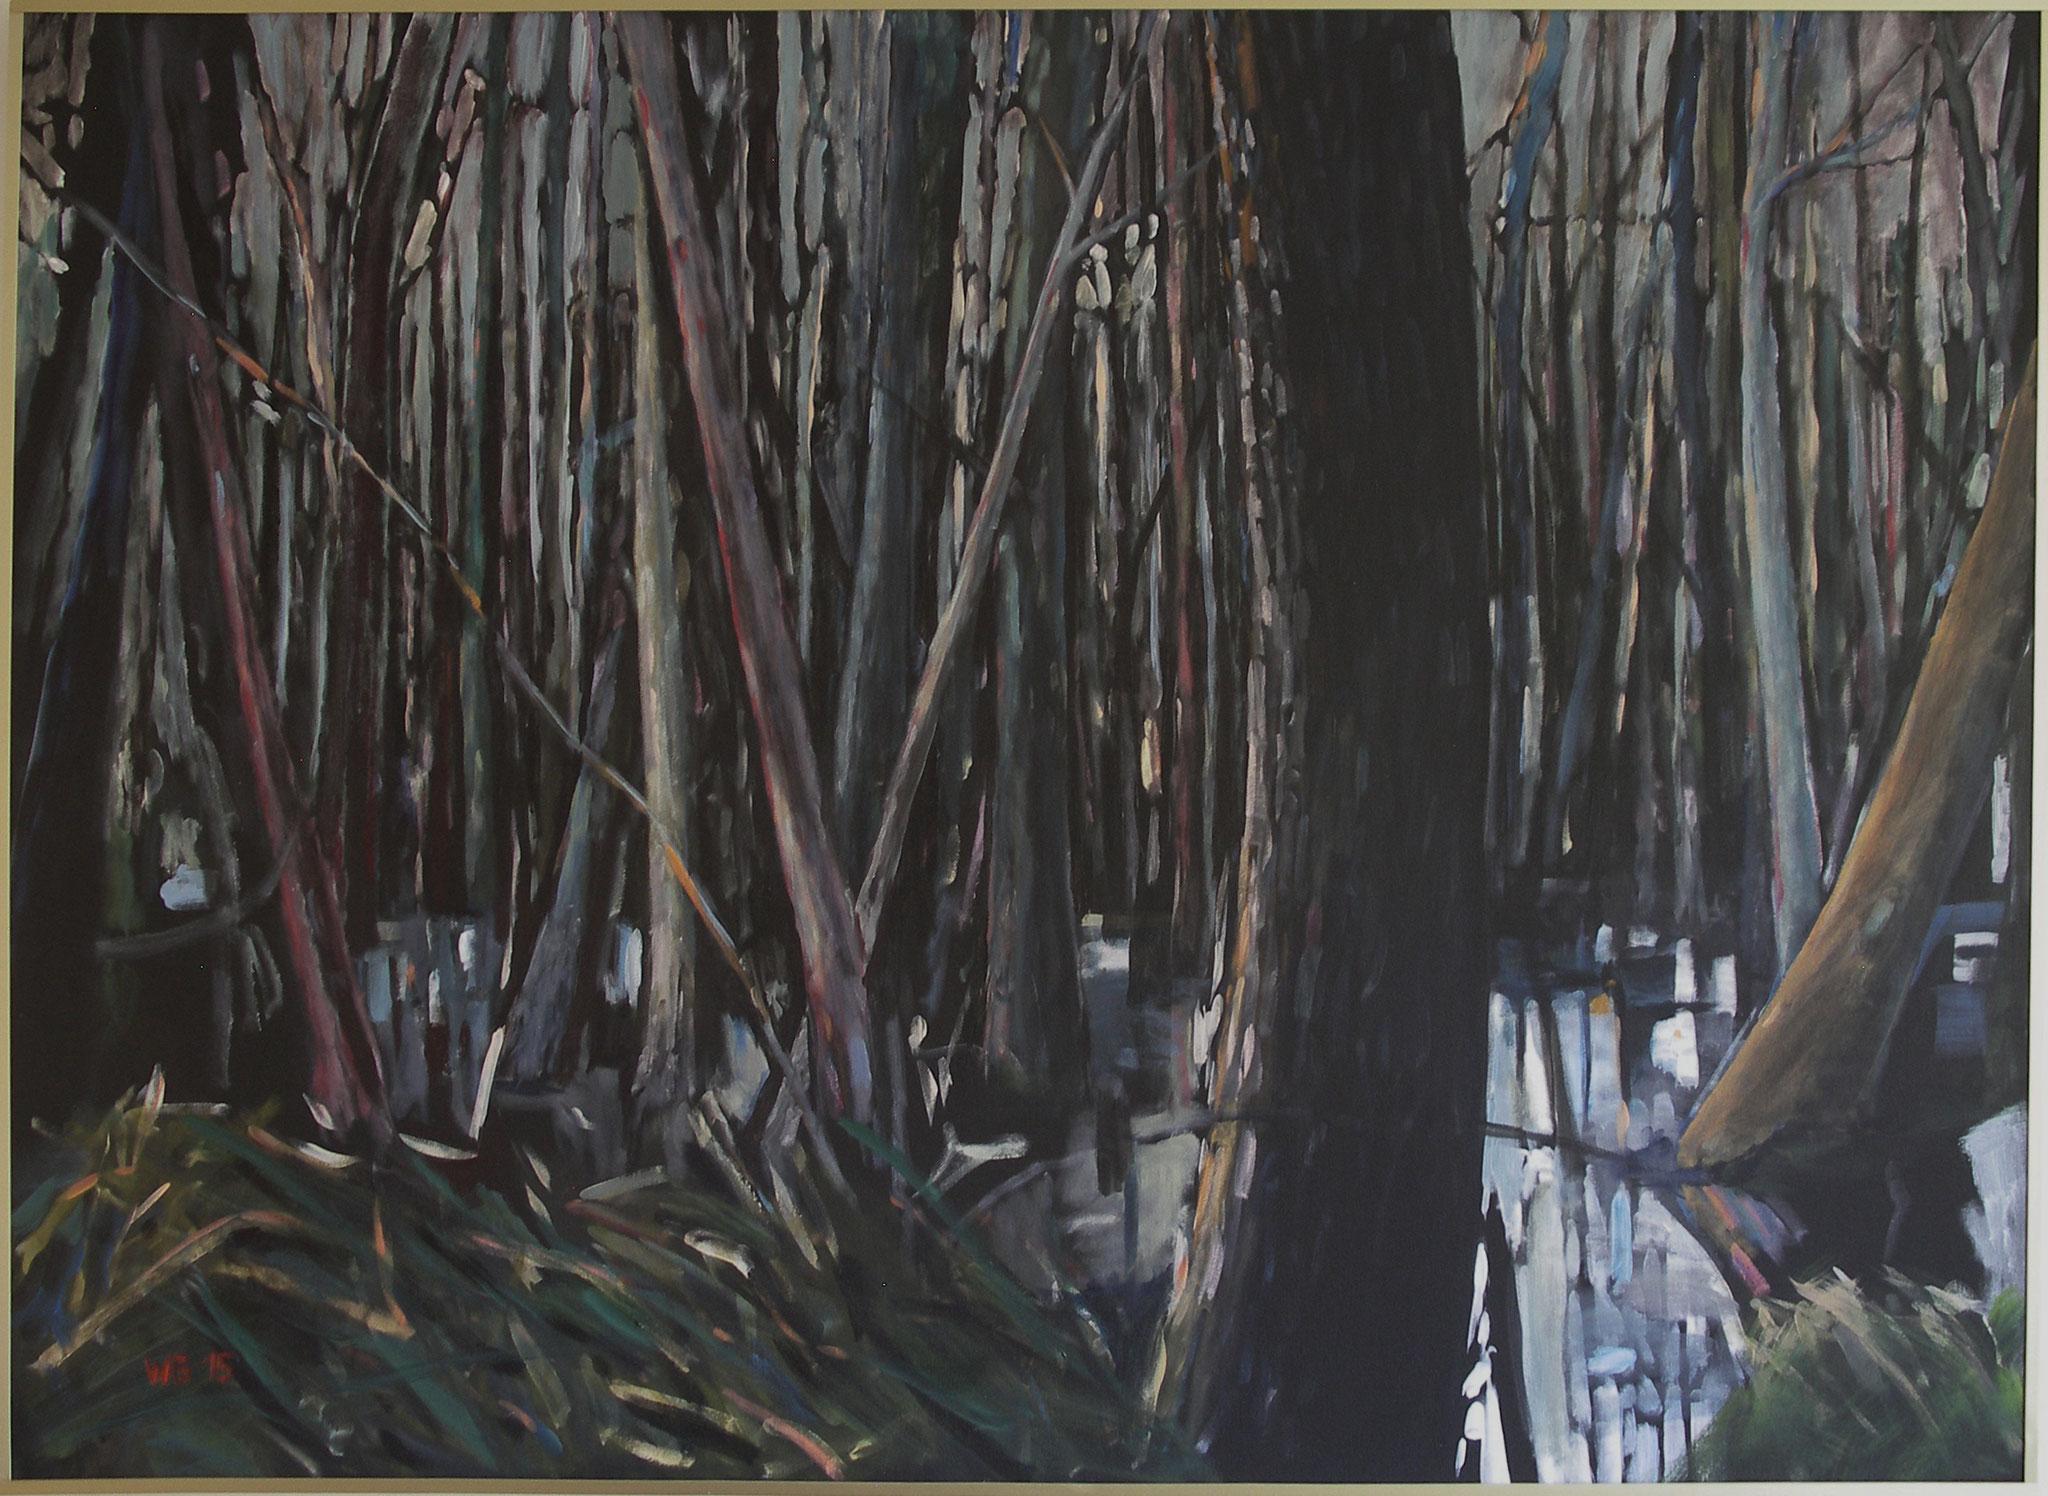 """Bäume im Sumpf II"", Acryl auf Baumwolle, 100x140, 2015"